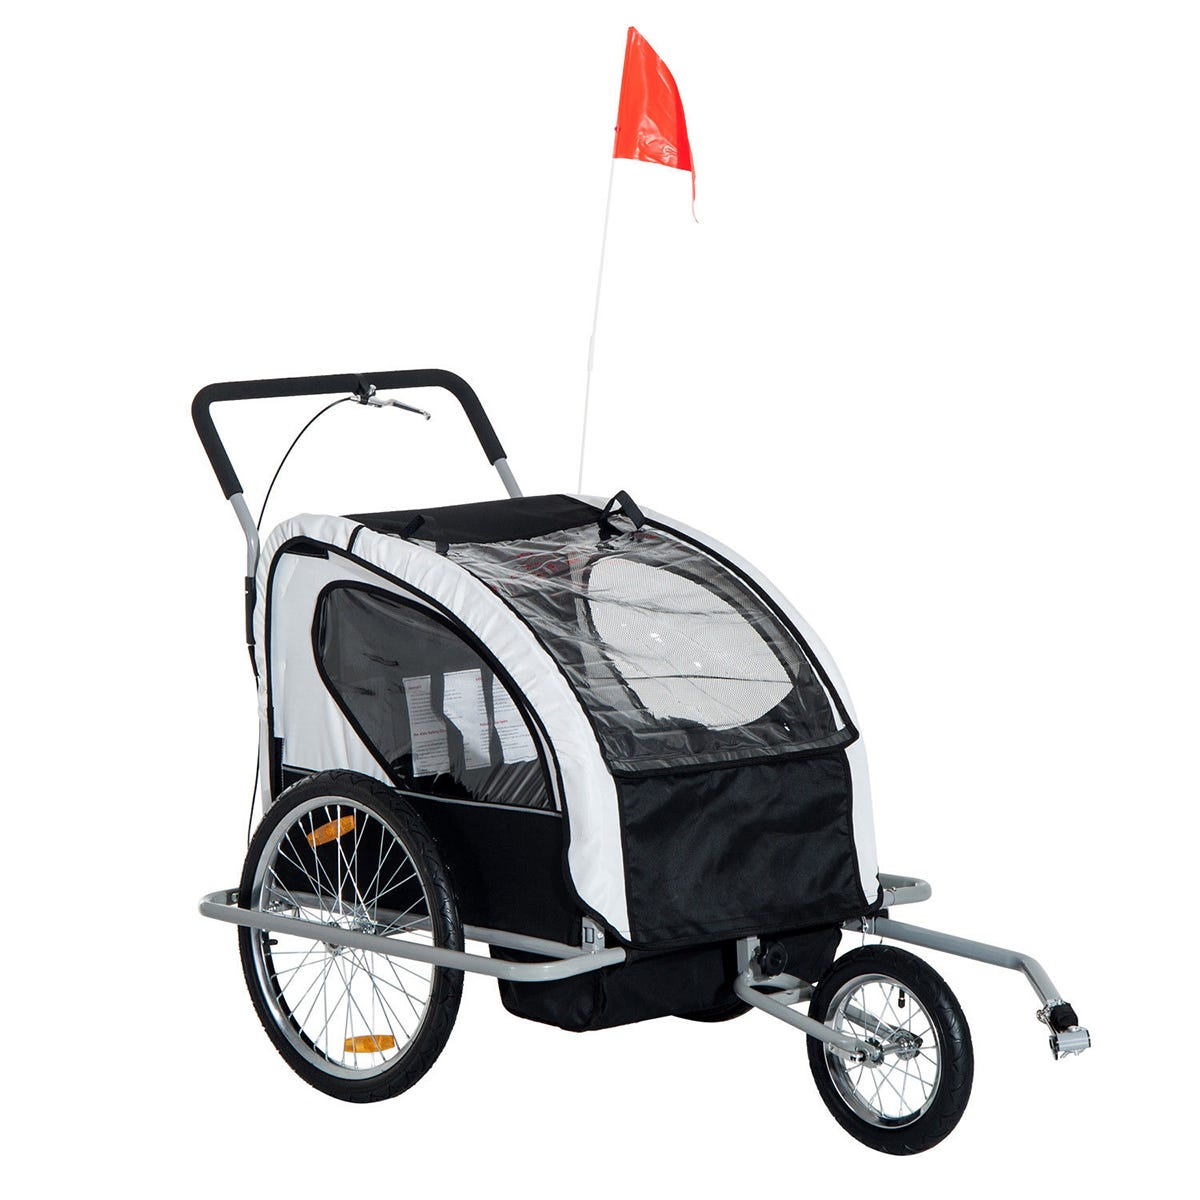 Reiten 2-in-1 Collapsible 2-Seater Kids Stroller & Bike Trailer with Pivot Wheel - Black/Grey